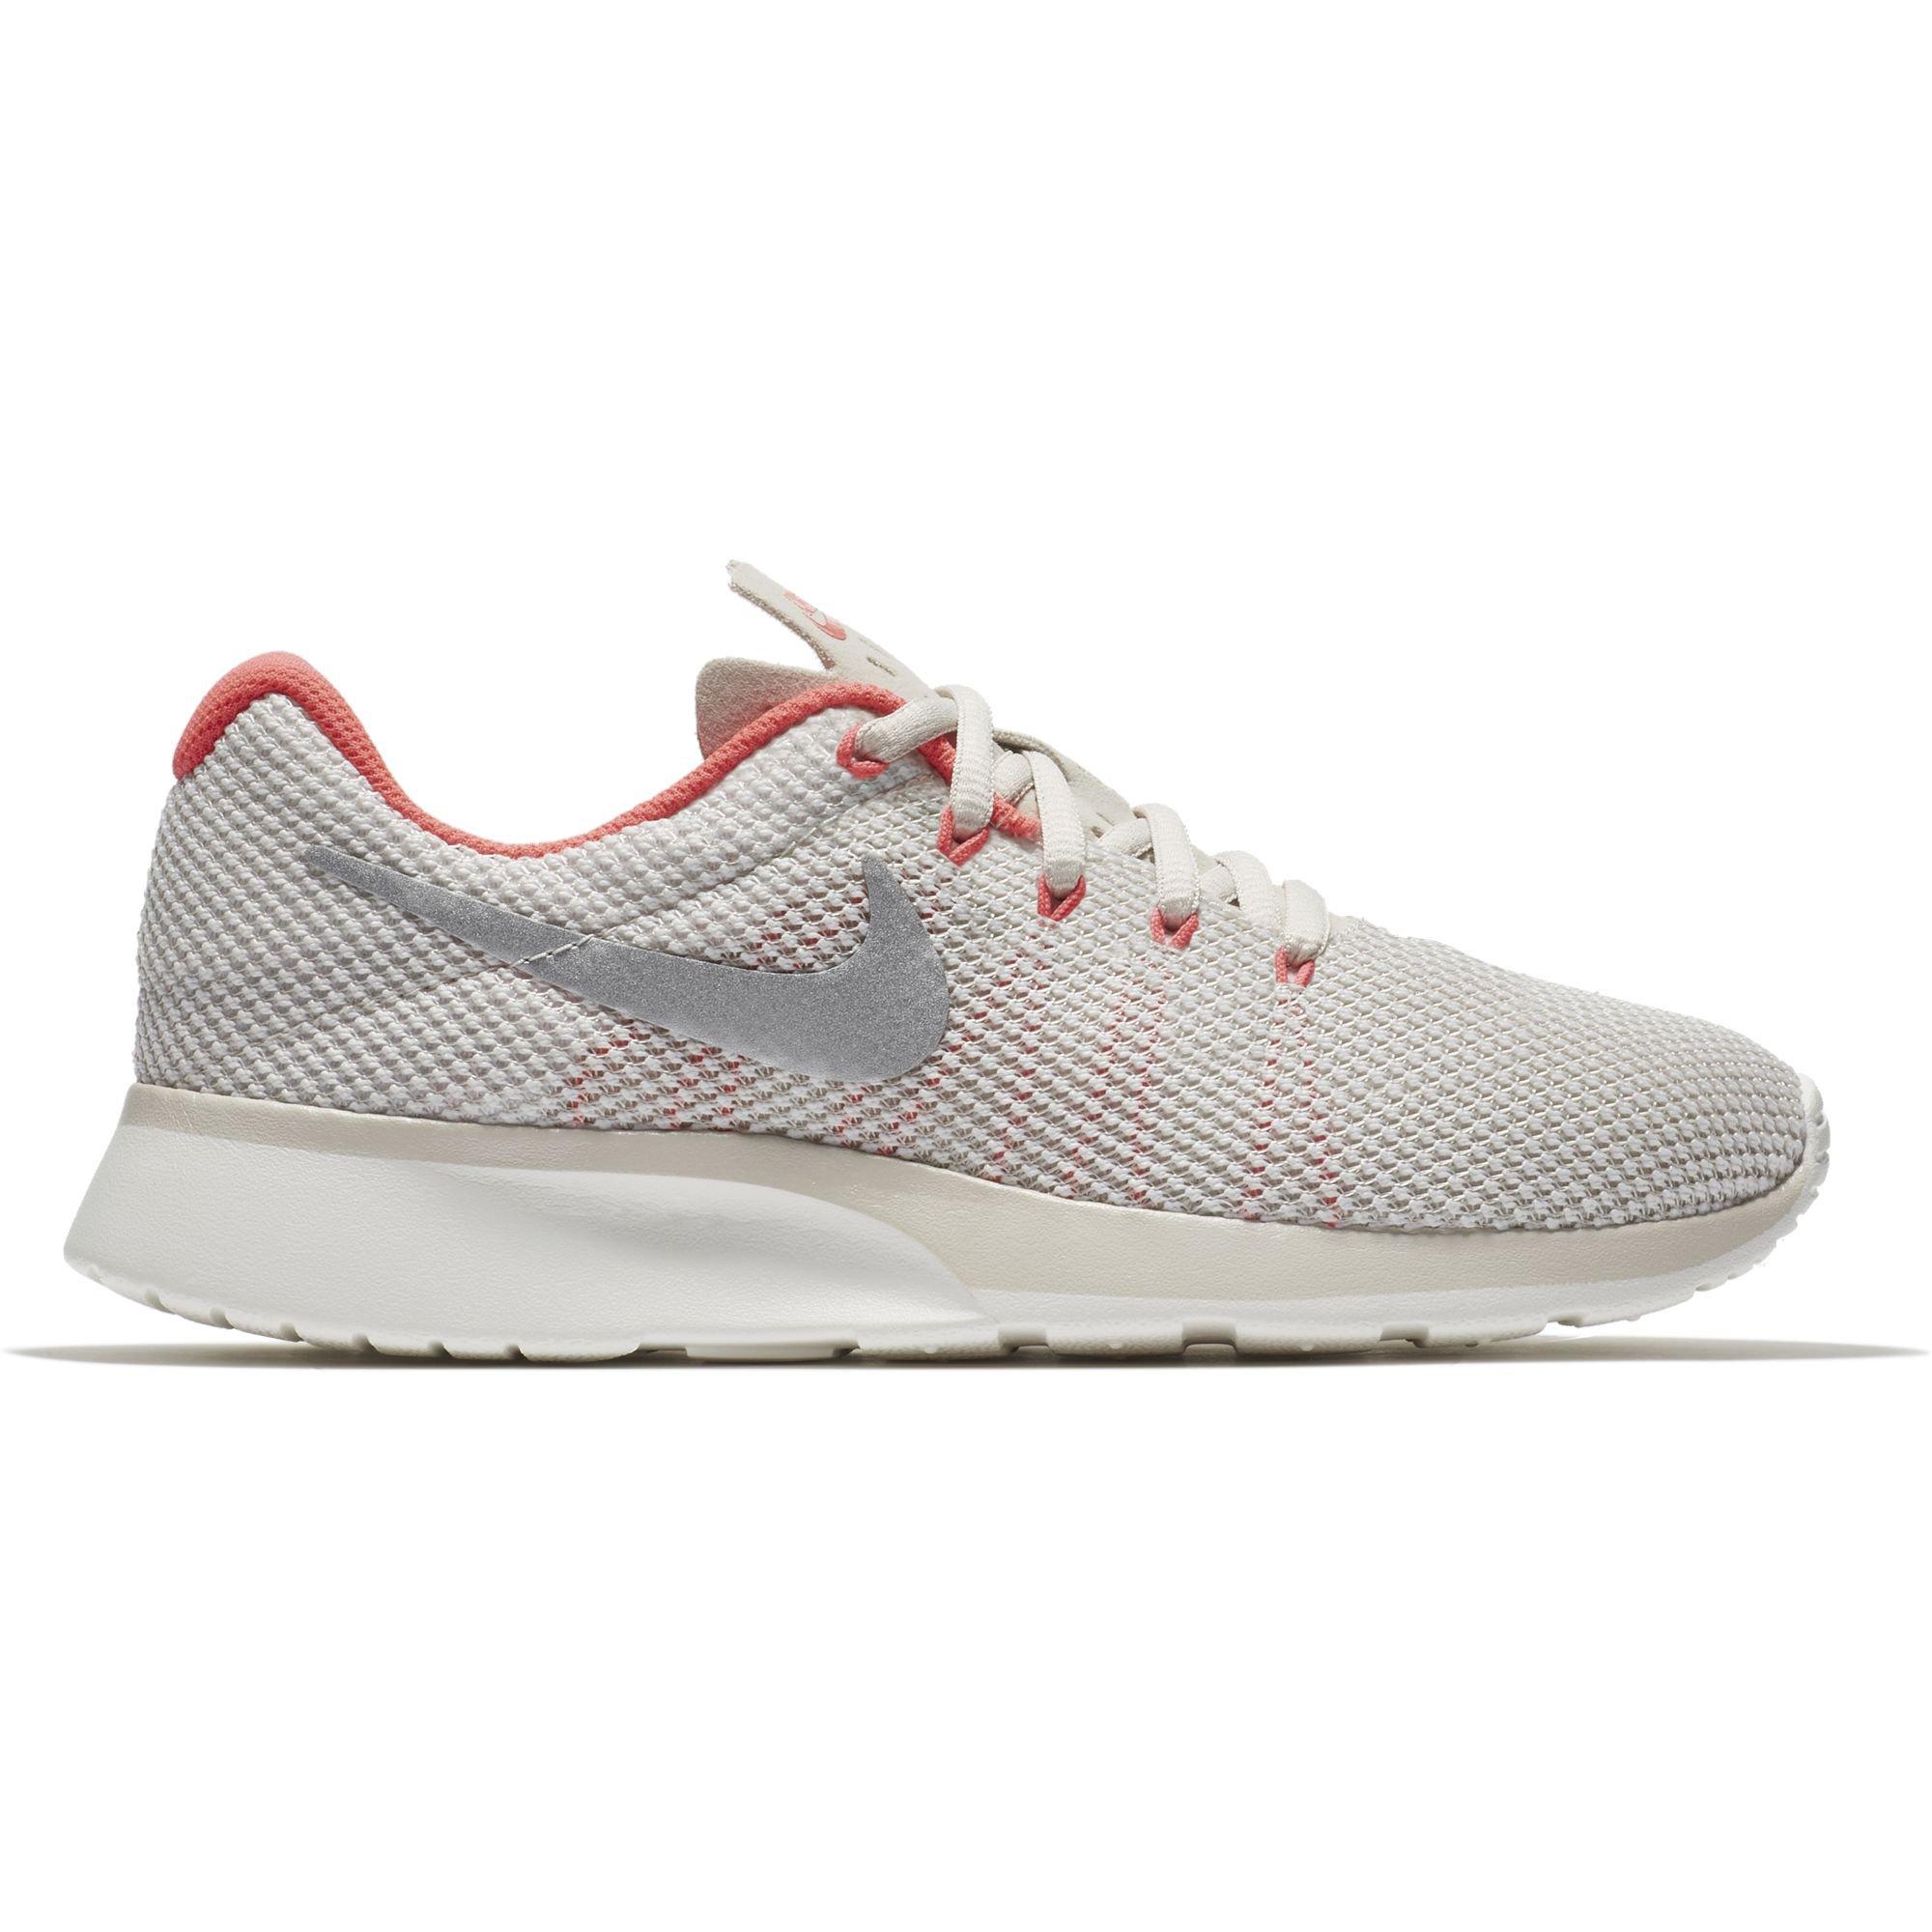 Nike Women's Tanjun Racer Running Shoe LT Orewood Brn/Chrom-Sail-Solar Red 9